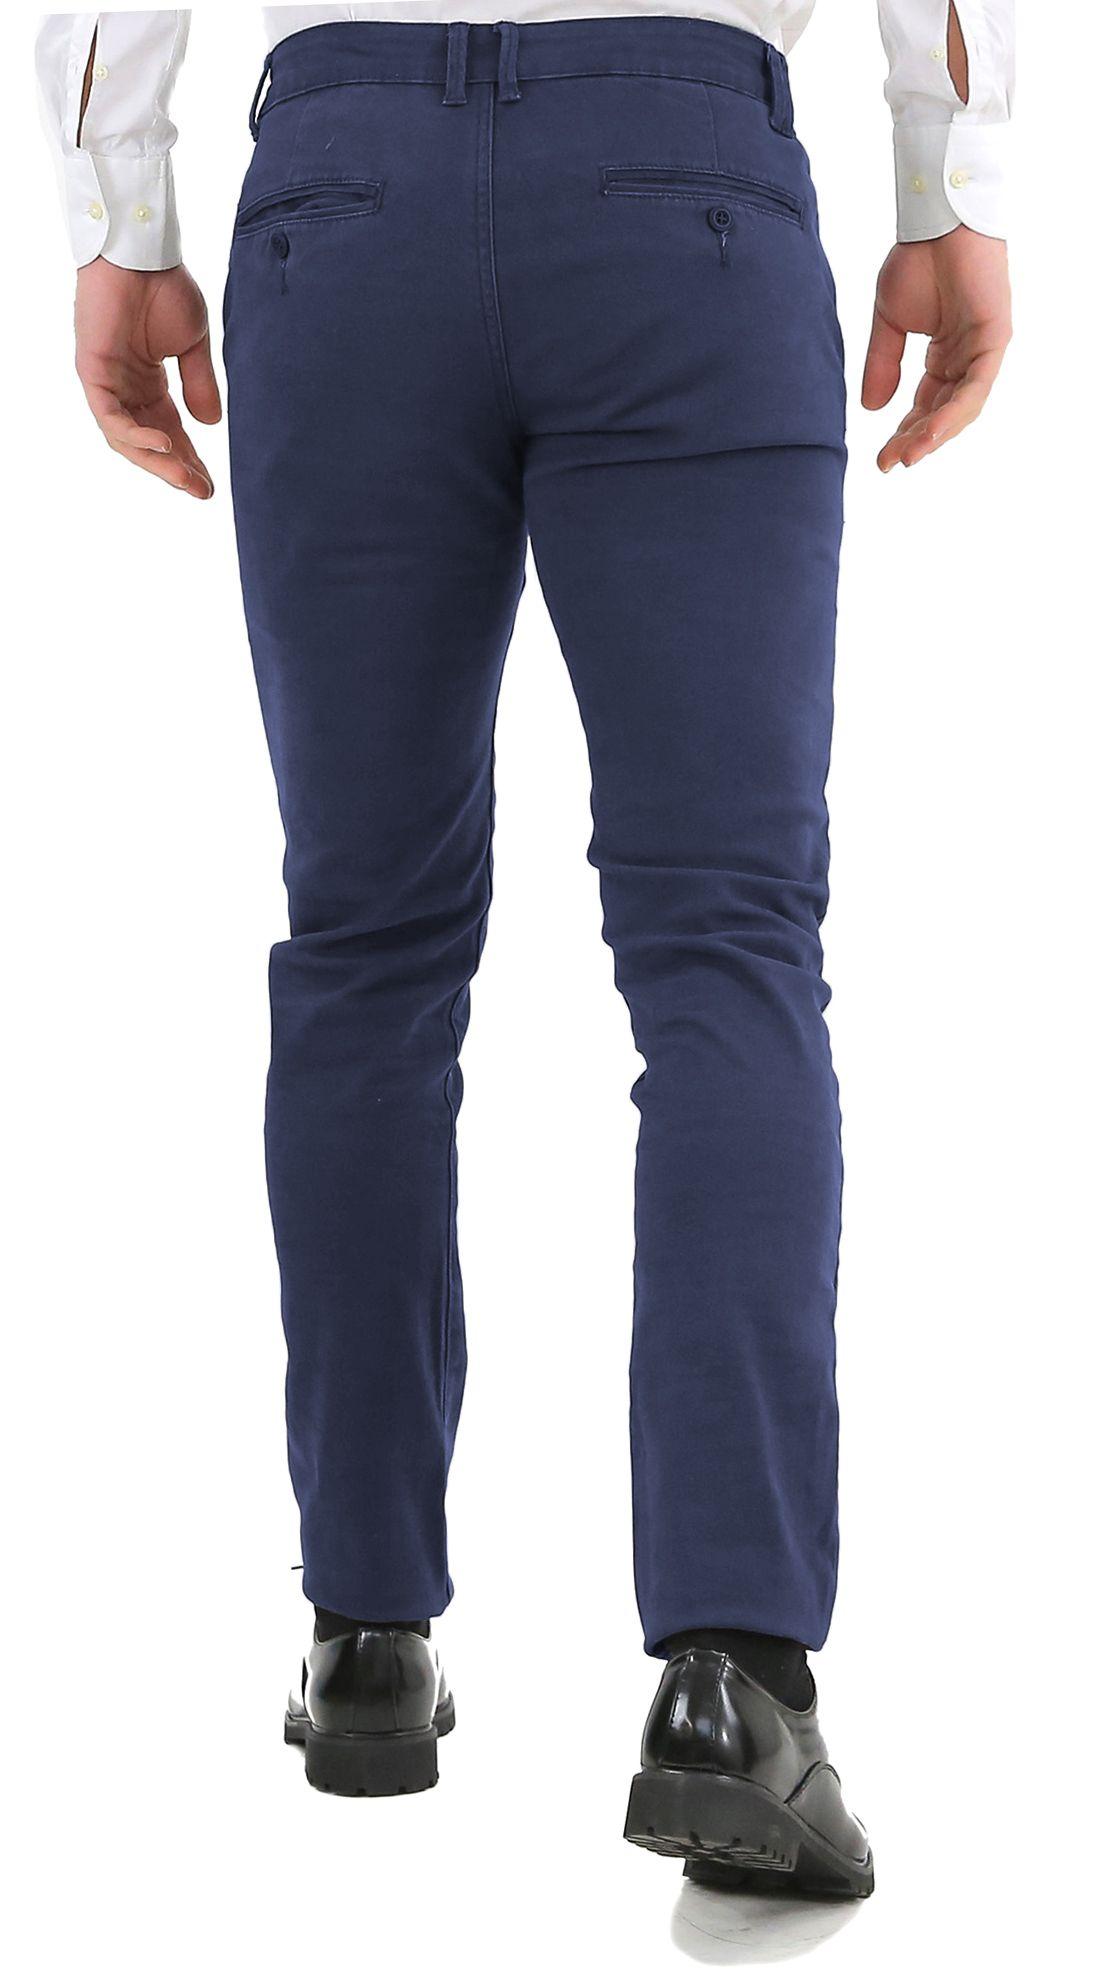 Pantaloni-Uomo-Slim-Fit-Eleganti-Invernali-Blu-Nero-Classico-Chino-Tasca-America miniatura 19